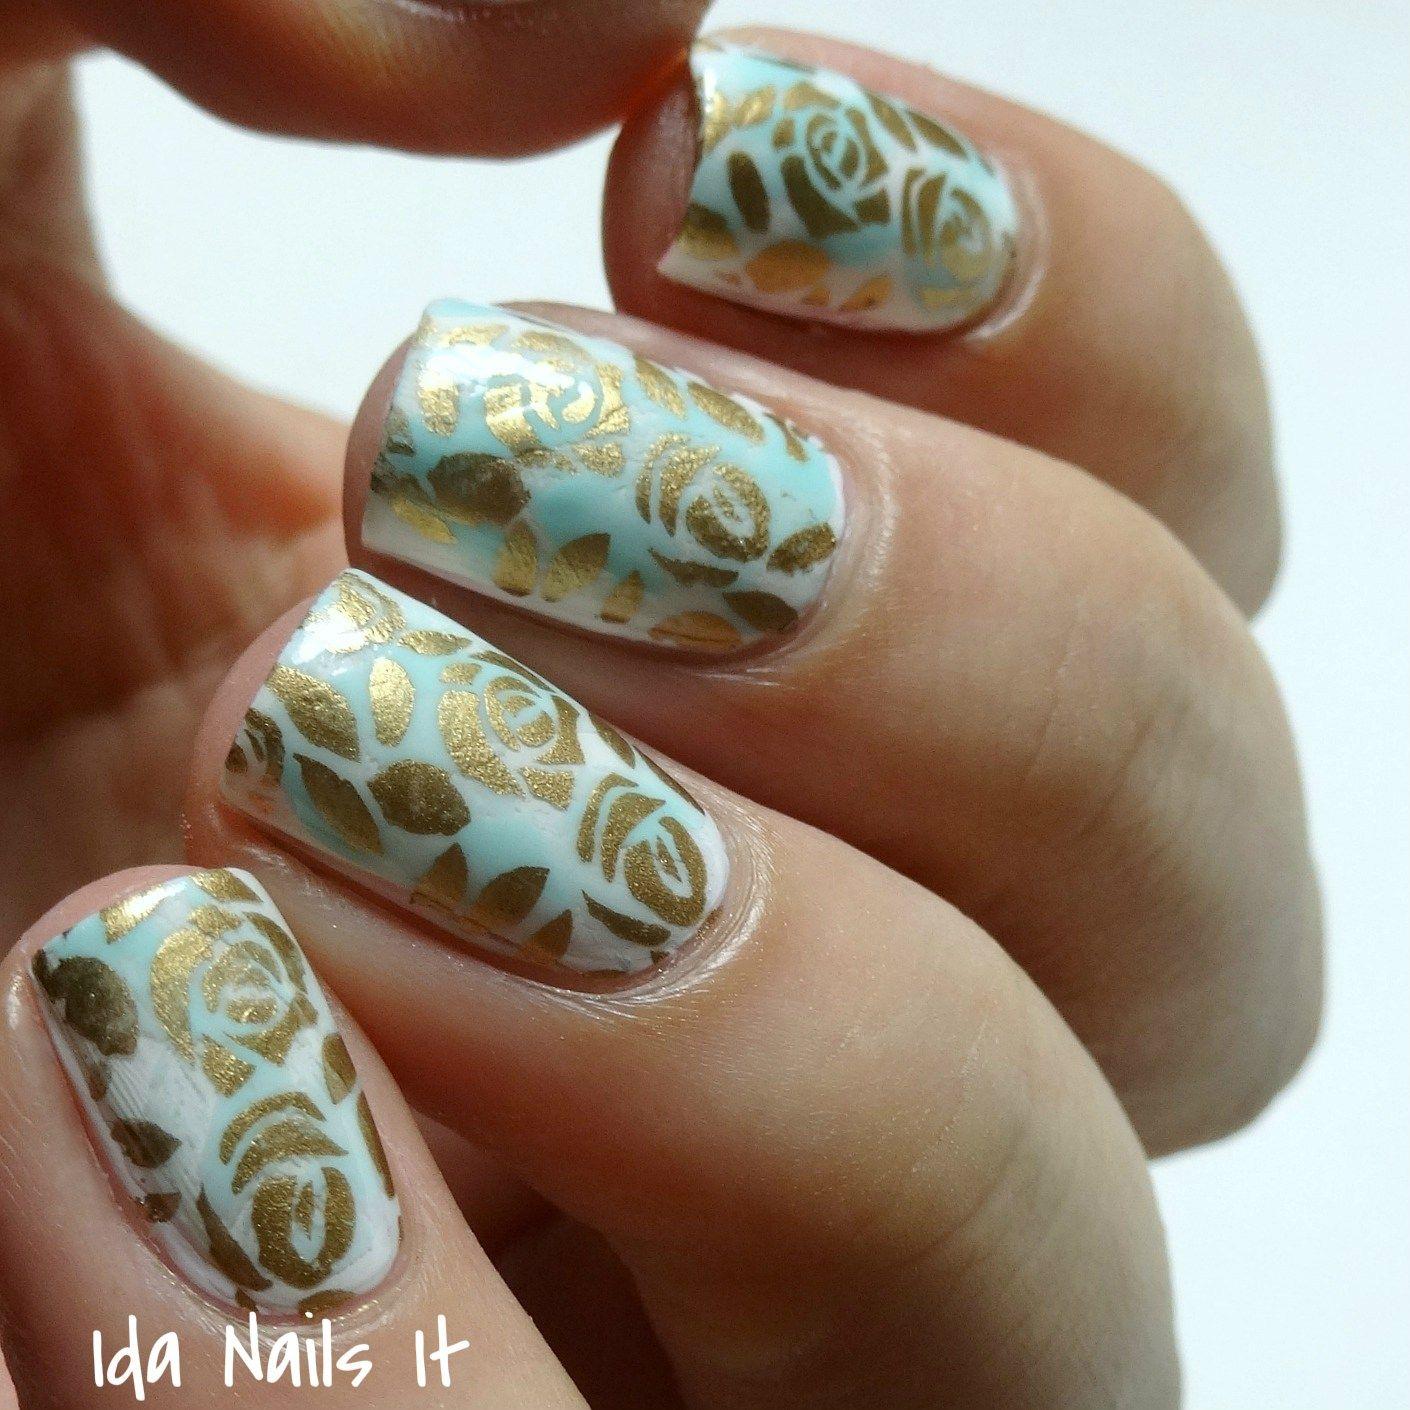 nails.quenalbertini: Ida Nails It Guest Post | Peachy Polish